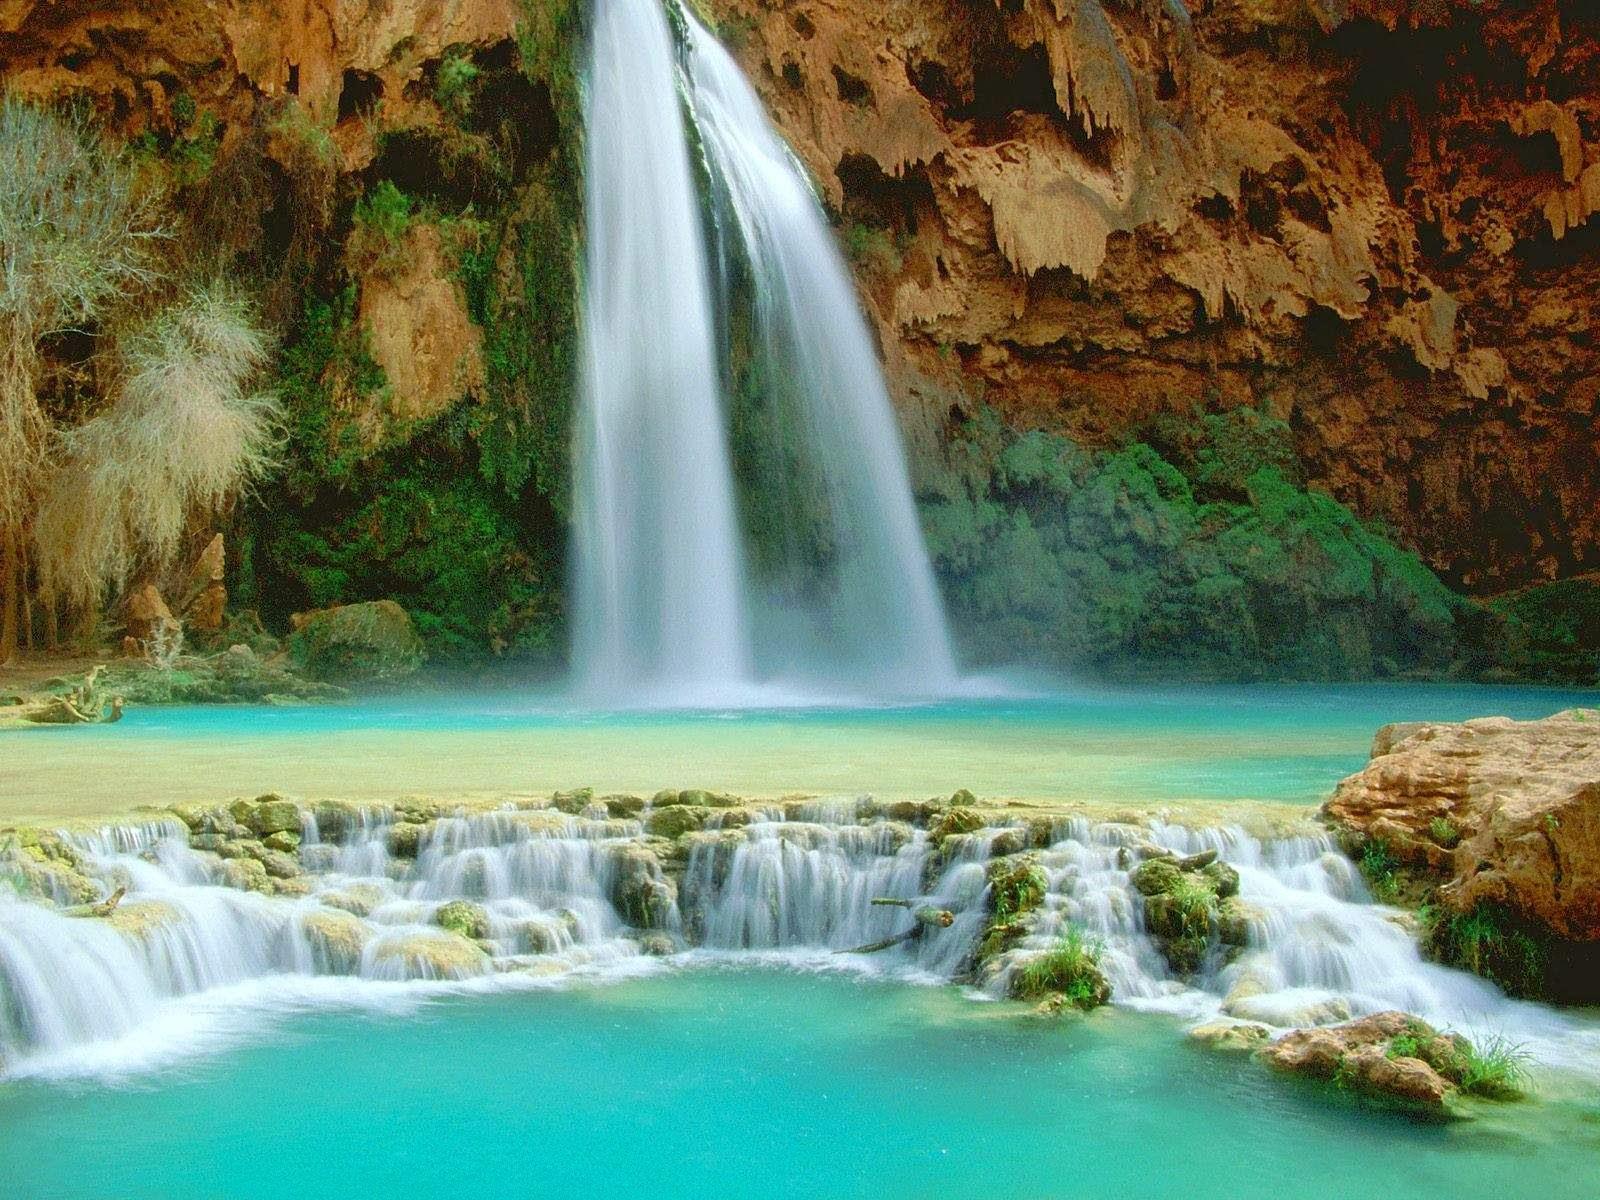 Download Beautiful 3D Nature WaterFall HD Wallpaper 1600x1200